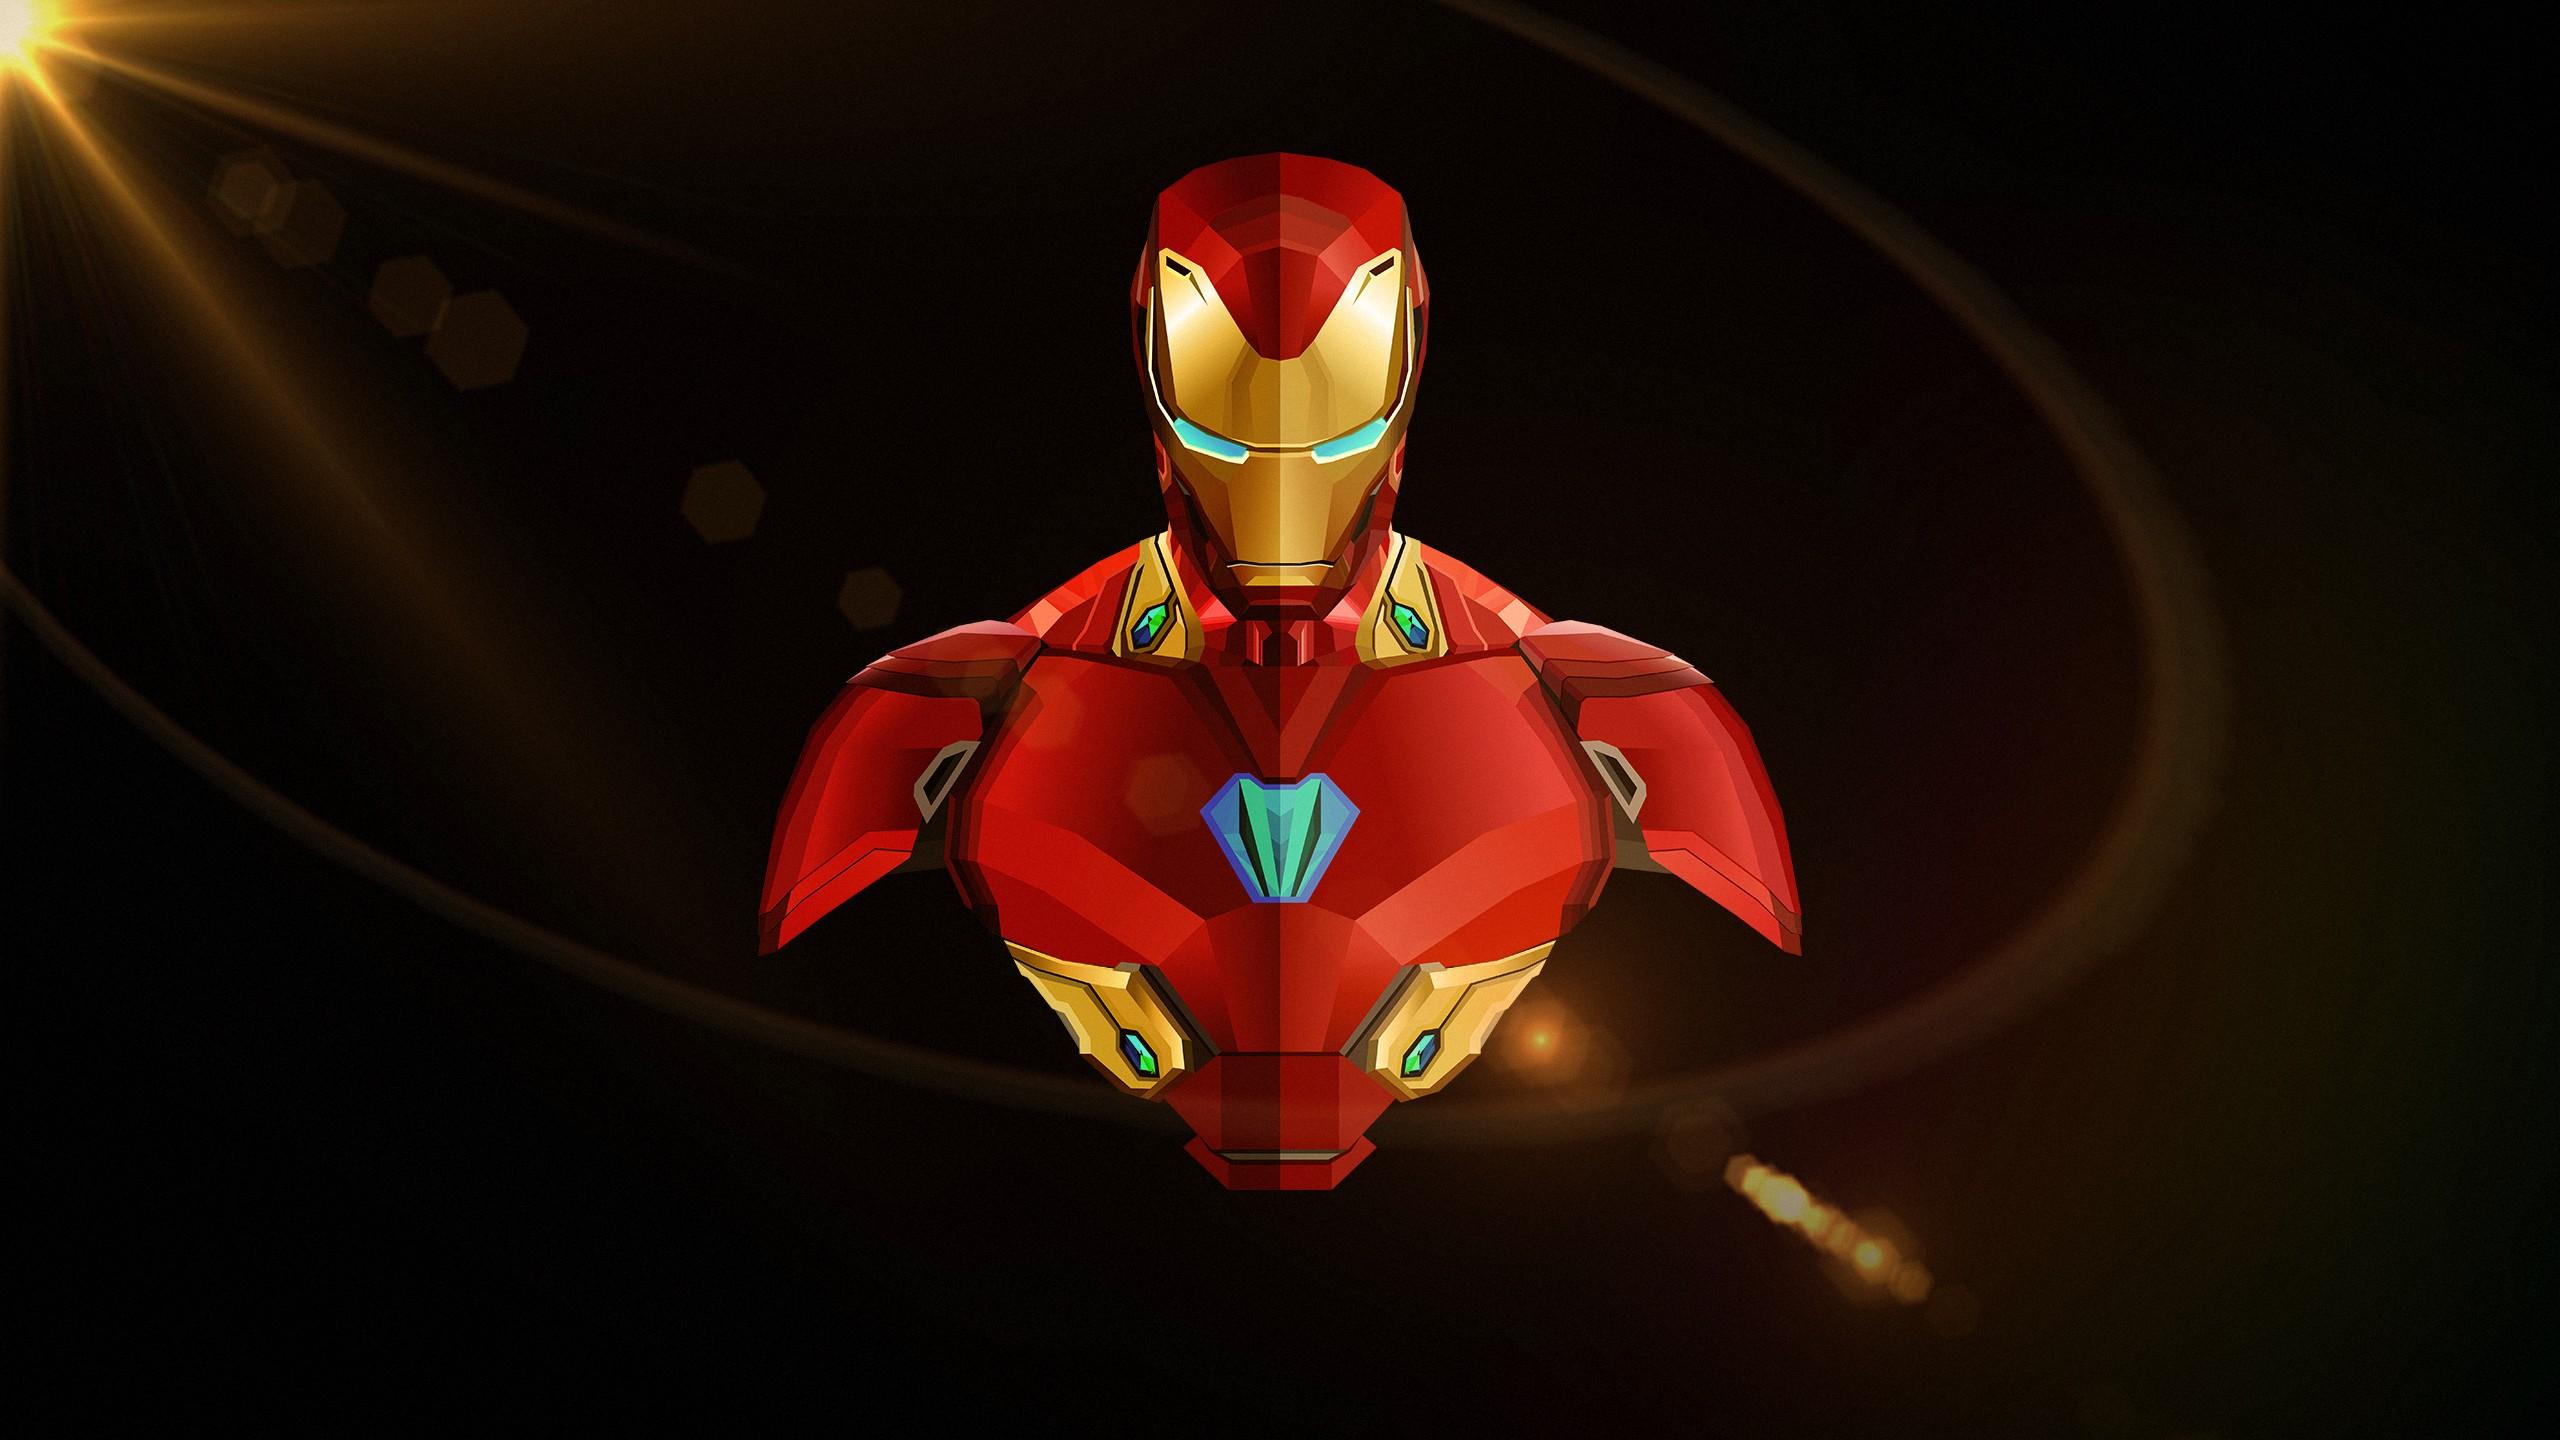 Animated Skull Wallpaper Iron Man Avengers Infinity War Minimal Wallpapers Hd